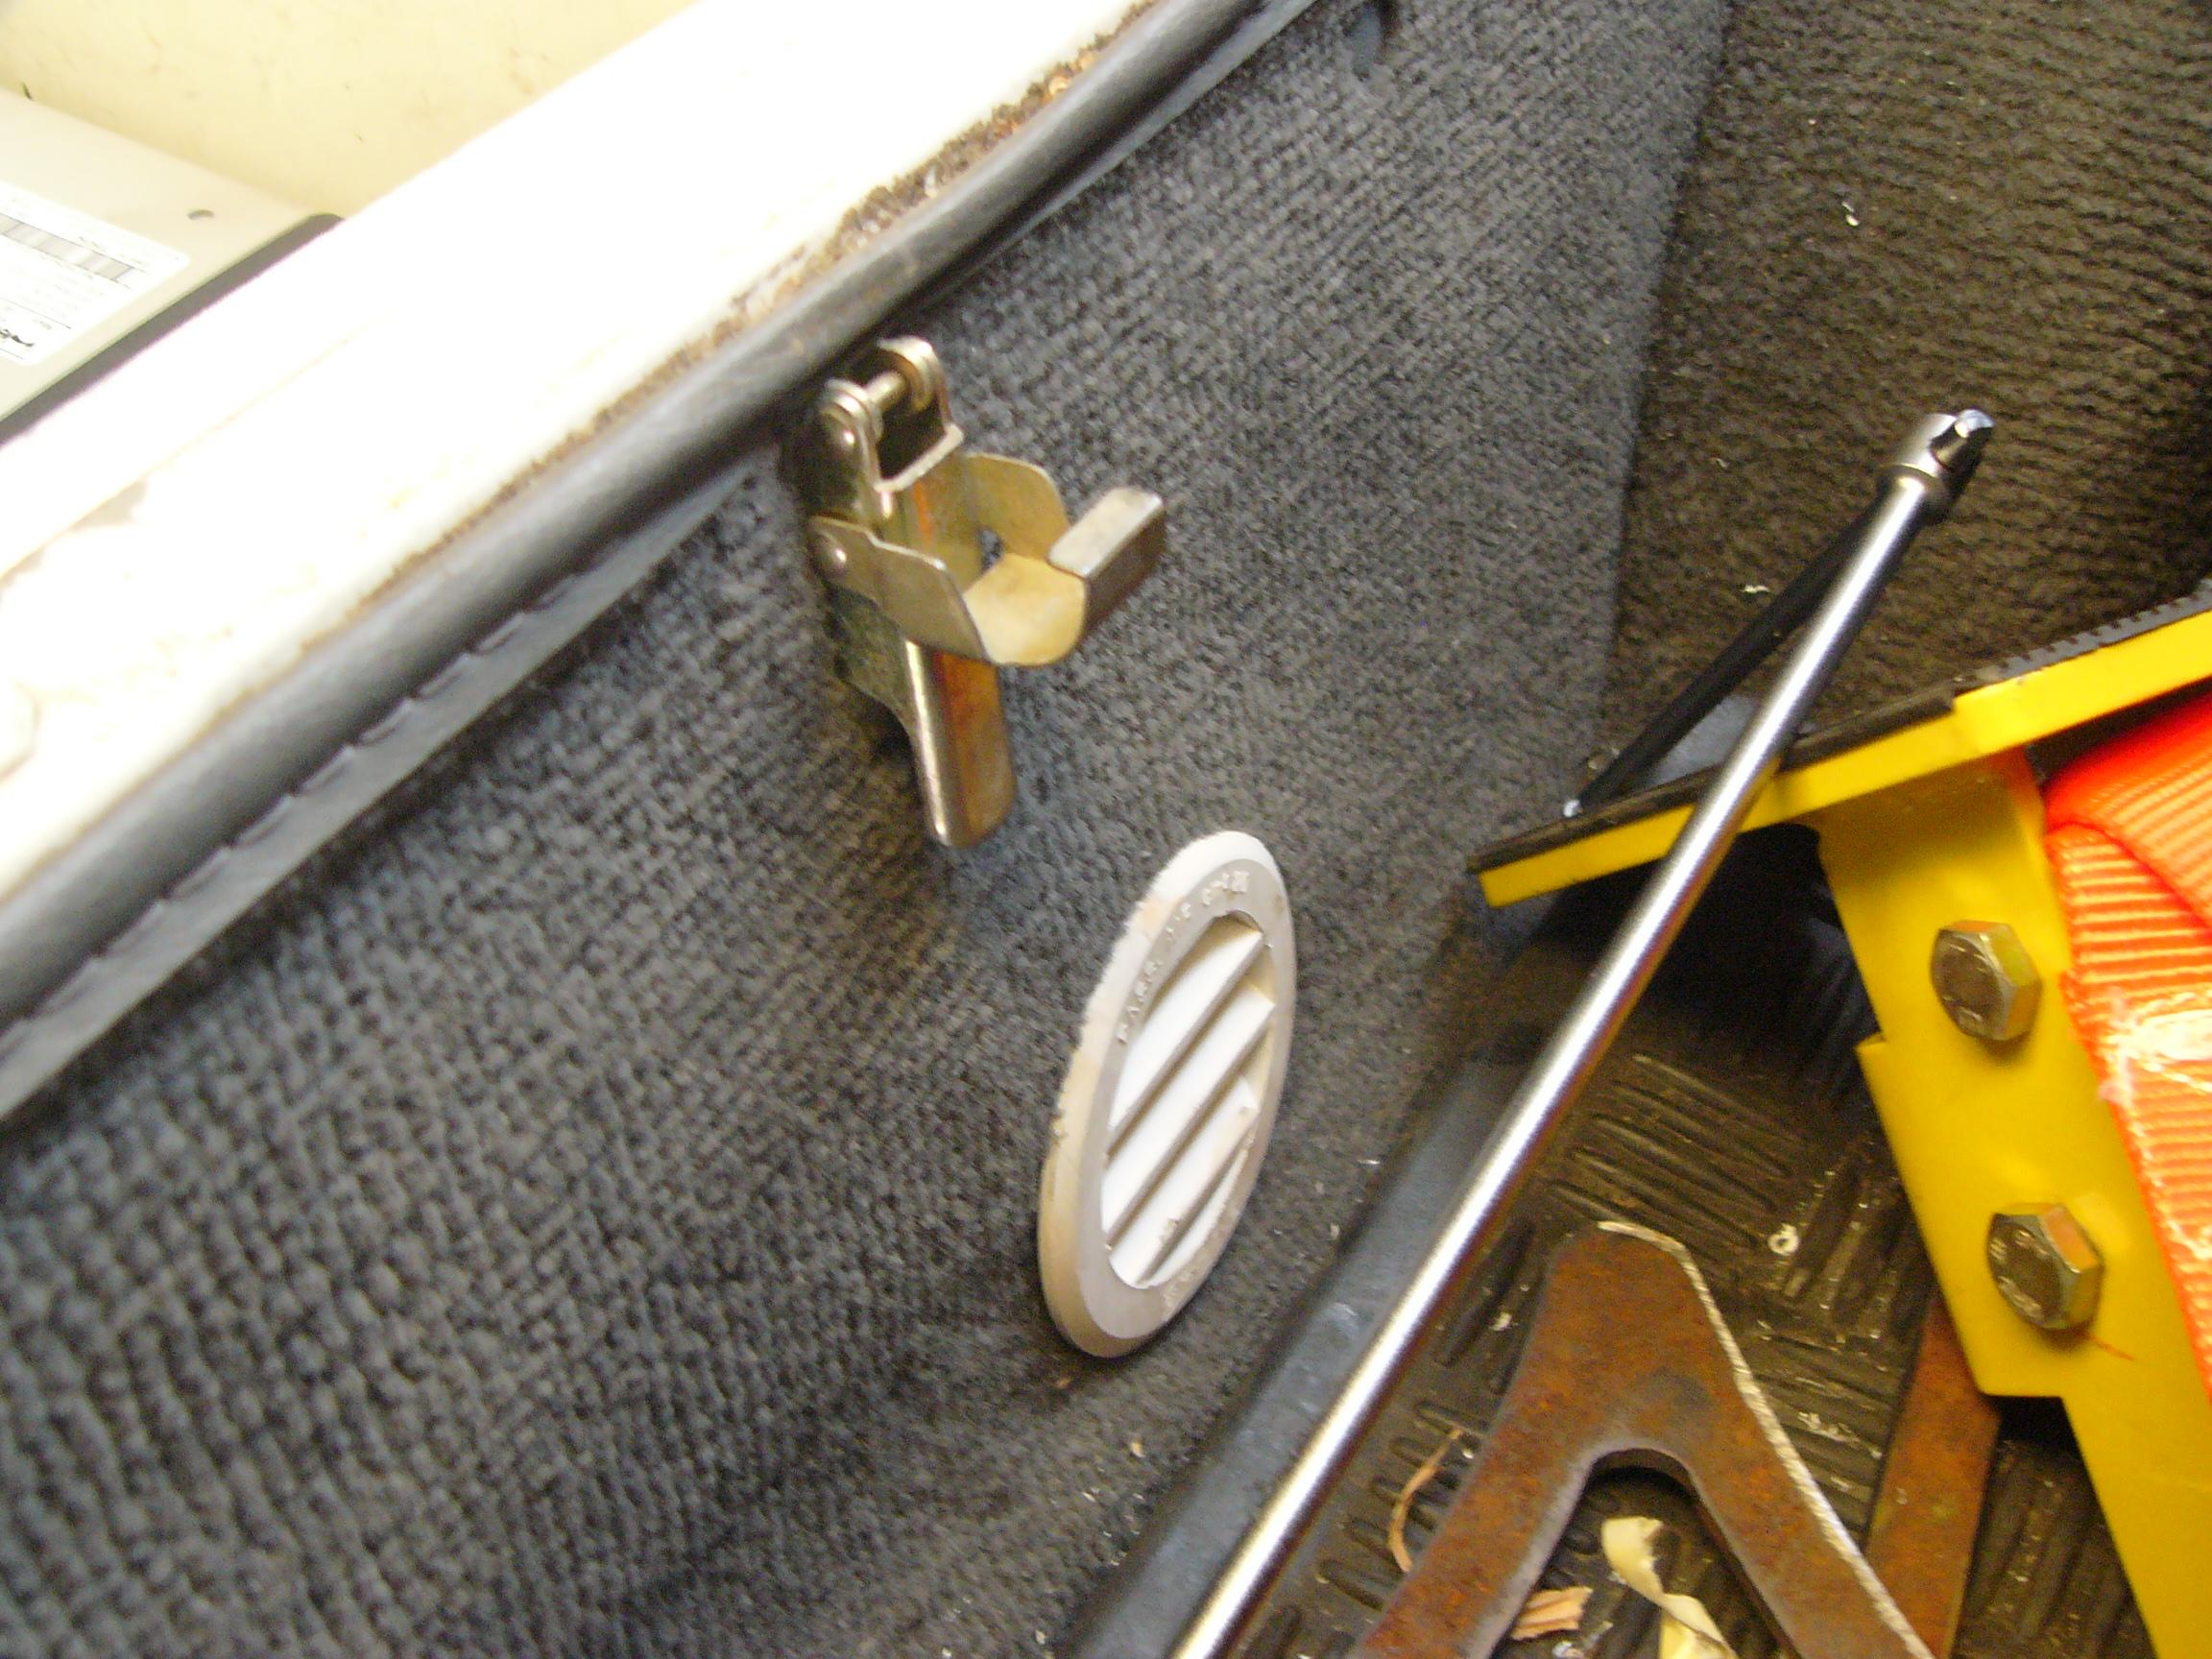 Schema Elettrico Webasto : Schema elettrico webasto air top fare di una mosca